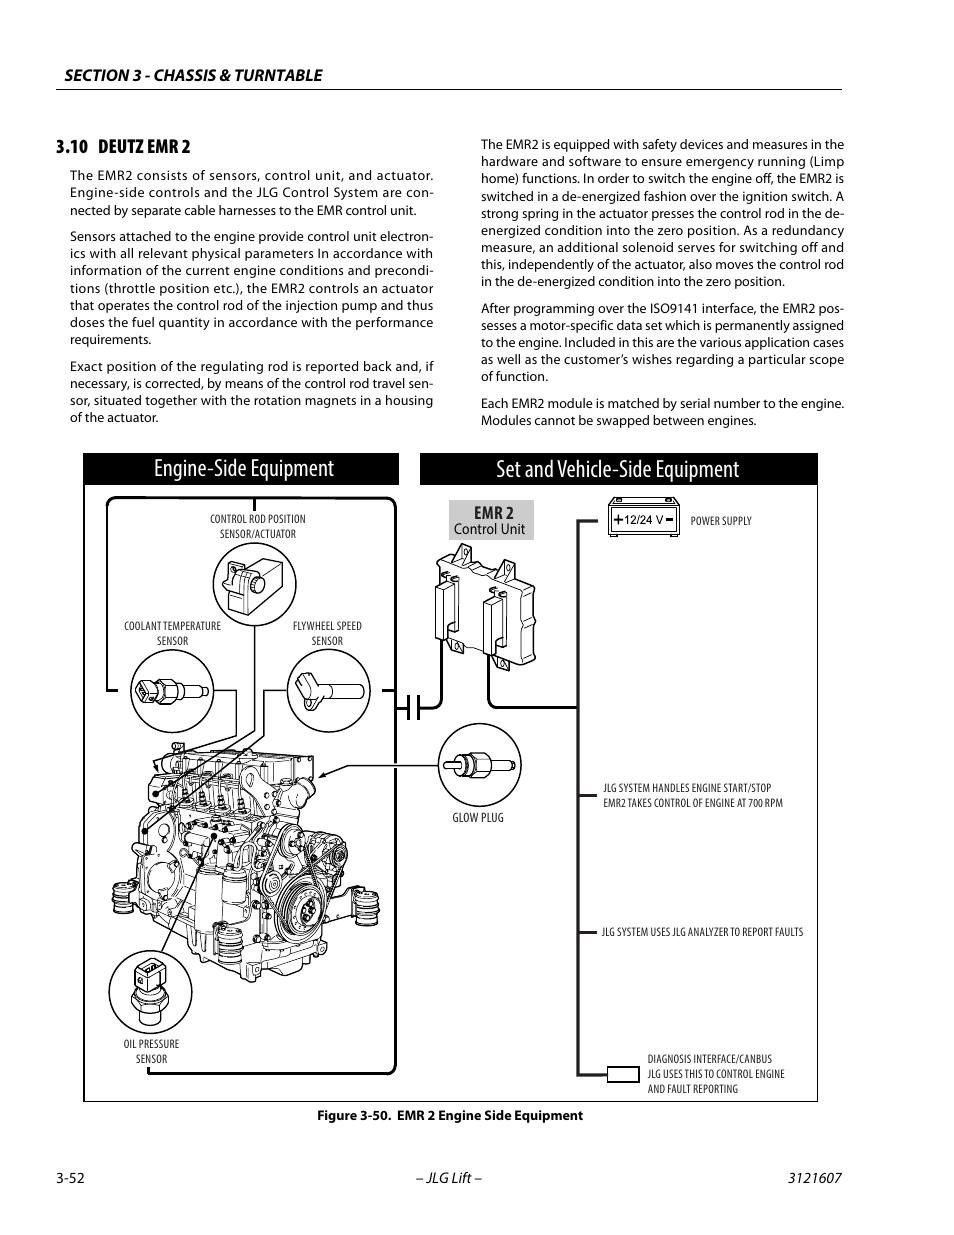 deutz emr2 wiring diagram western plows 10 emr 2 52 engine side equipment jlg 600sc 660sjc service manual user page 88 270